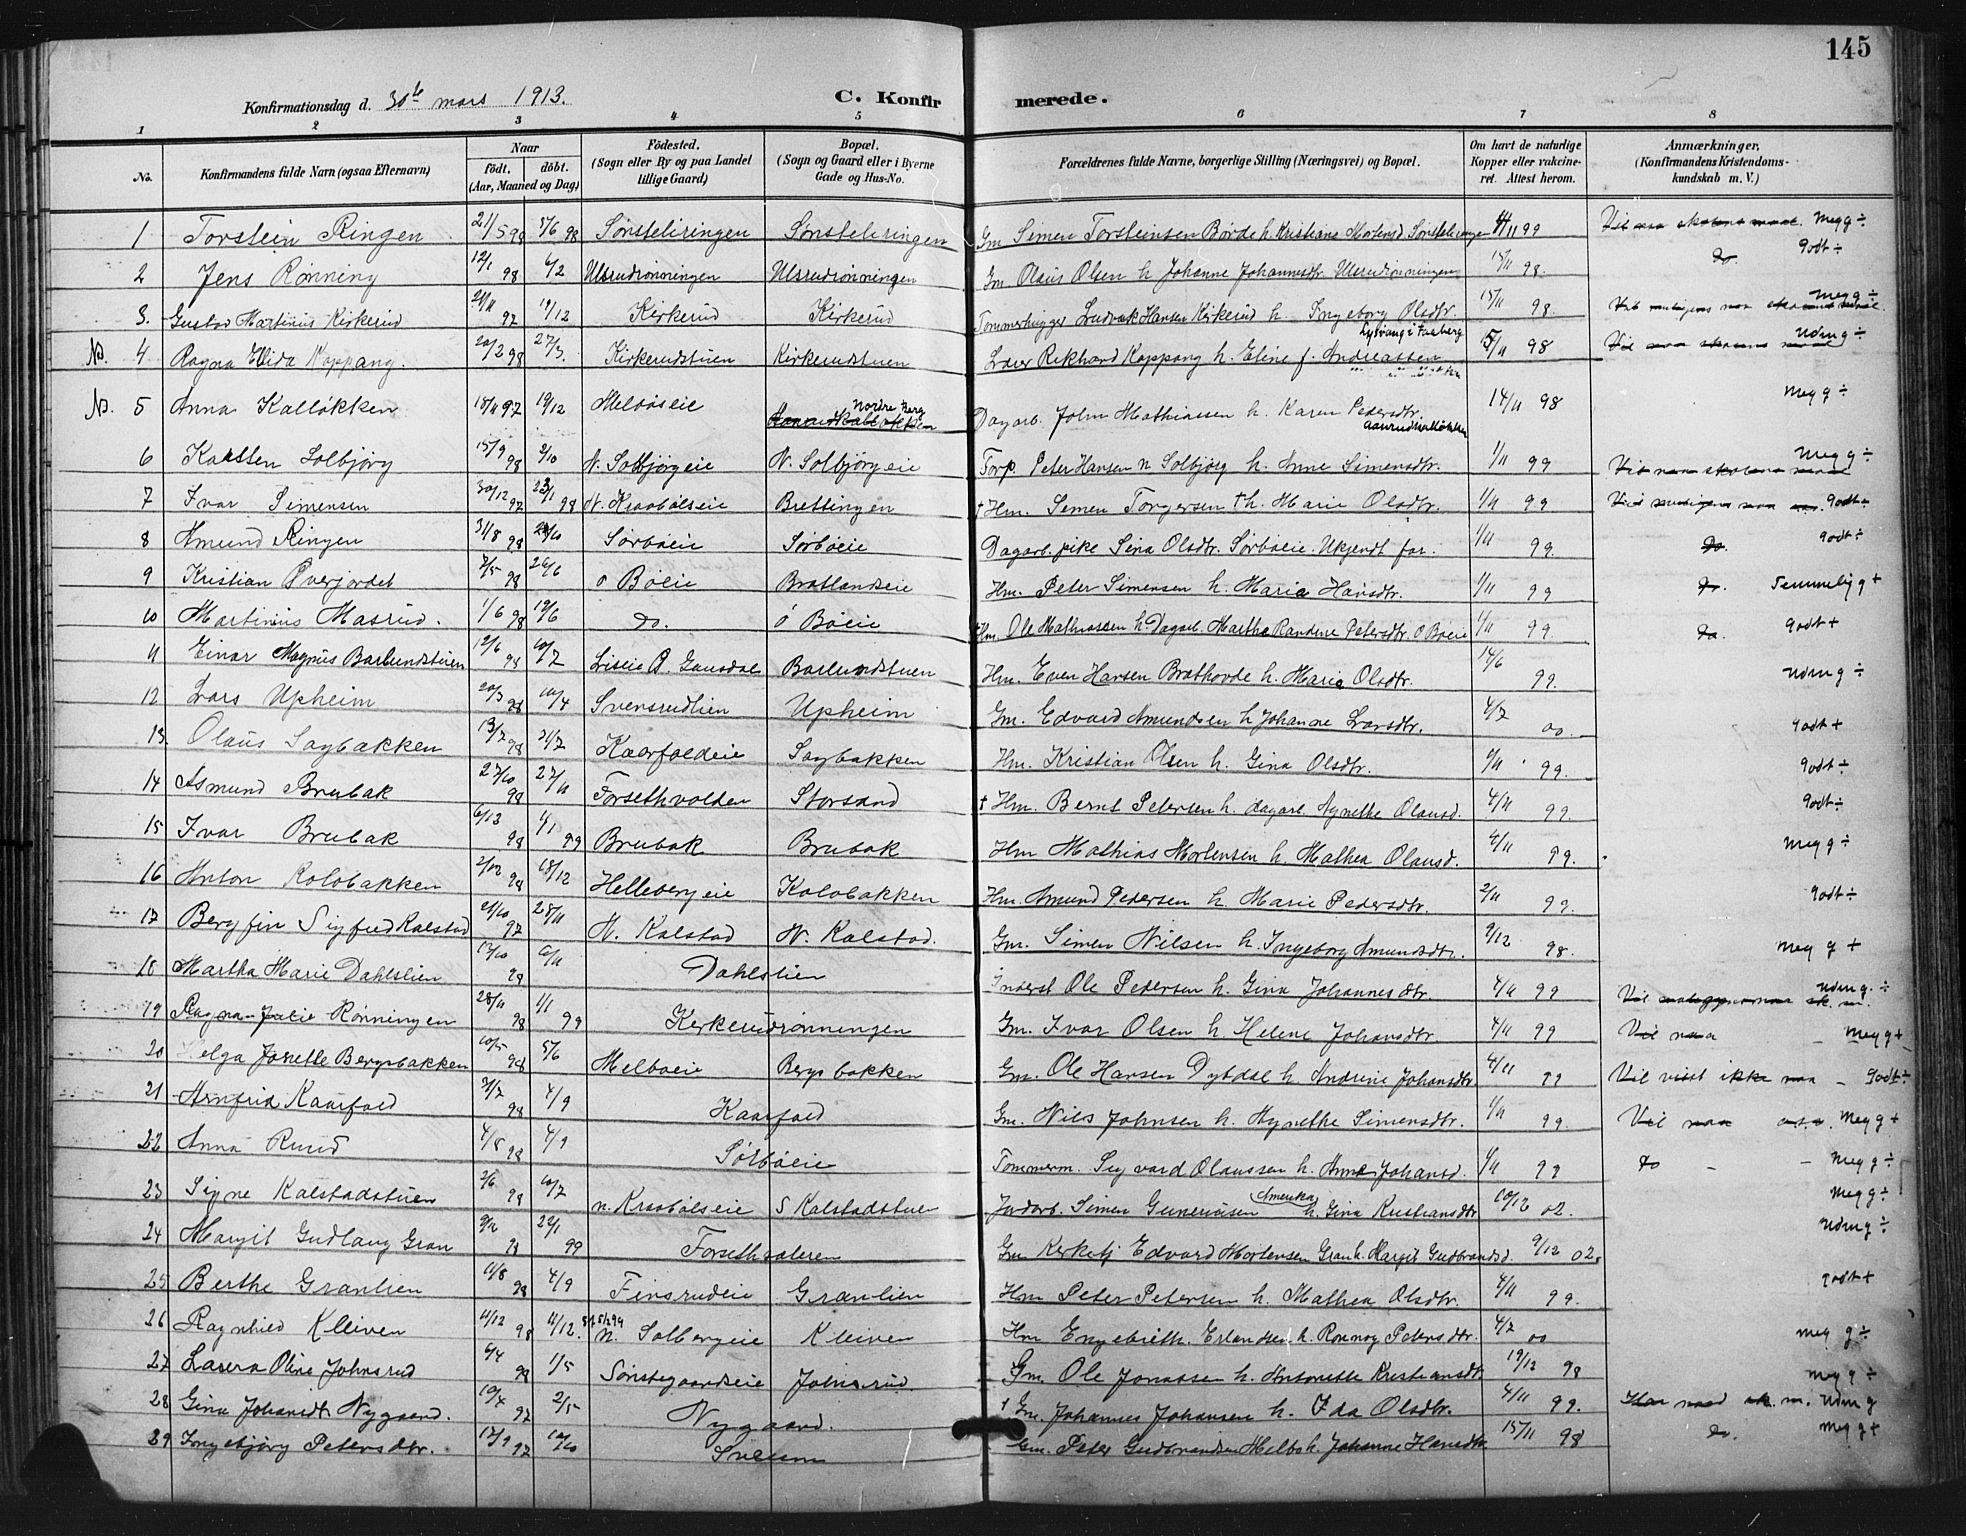 SAH, Vestre Gausdal prestekontor, Klokkerbok nr. 3, 1896-1925, s. 145